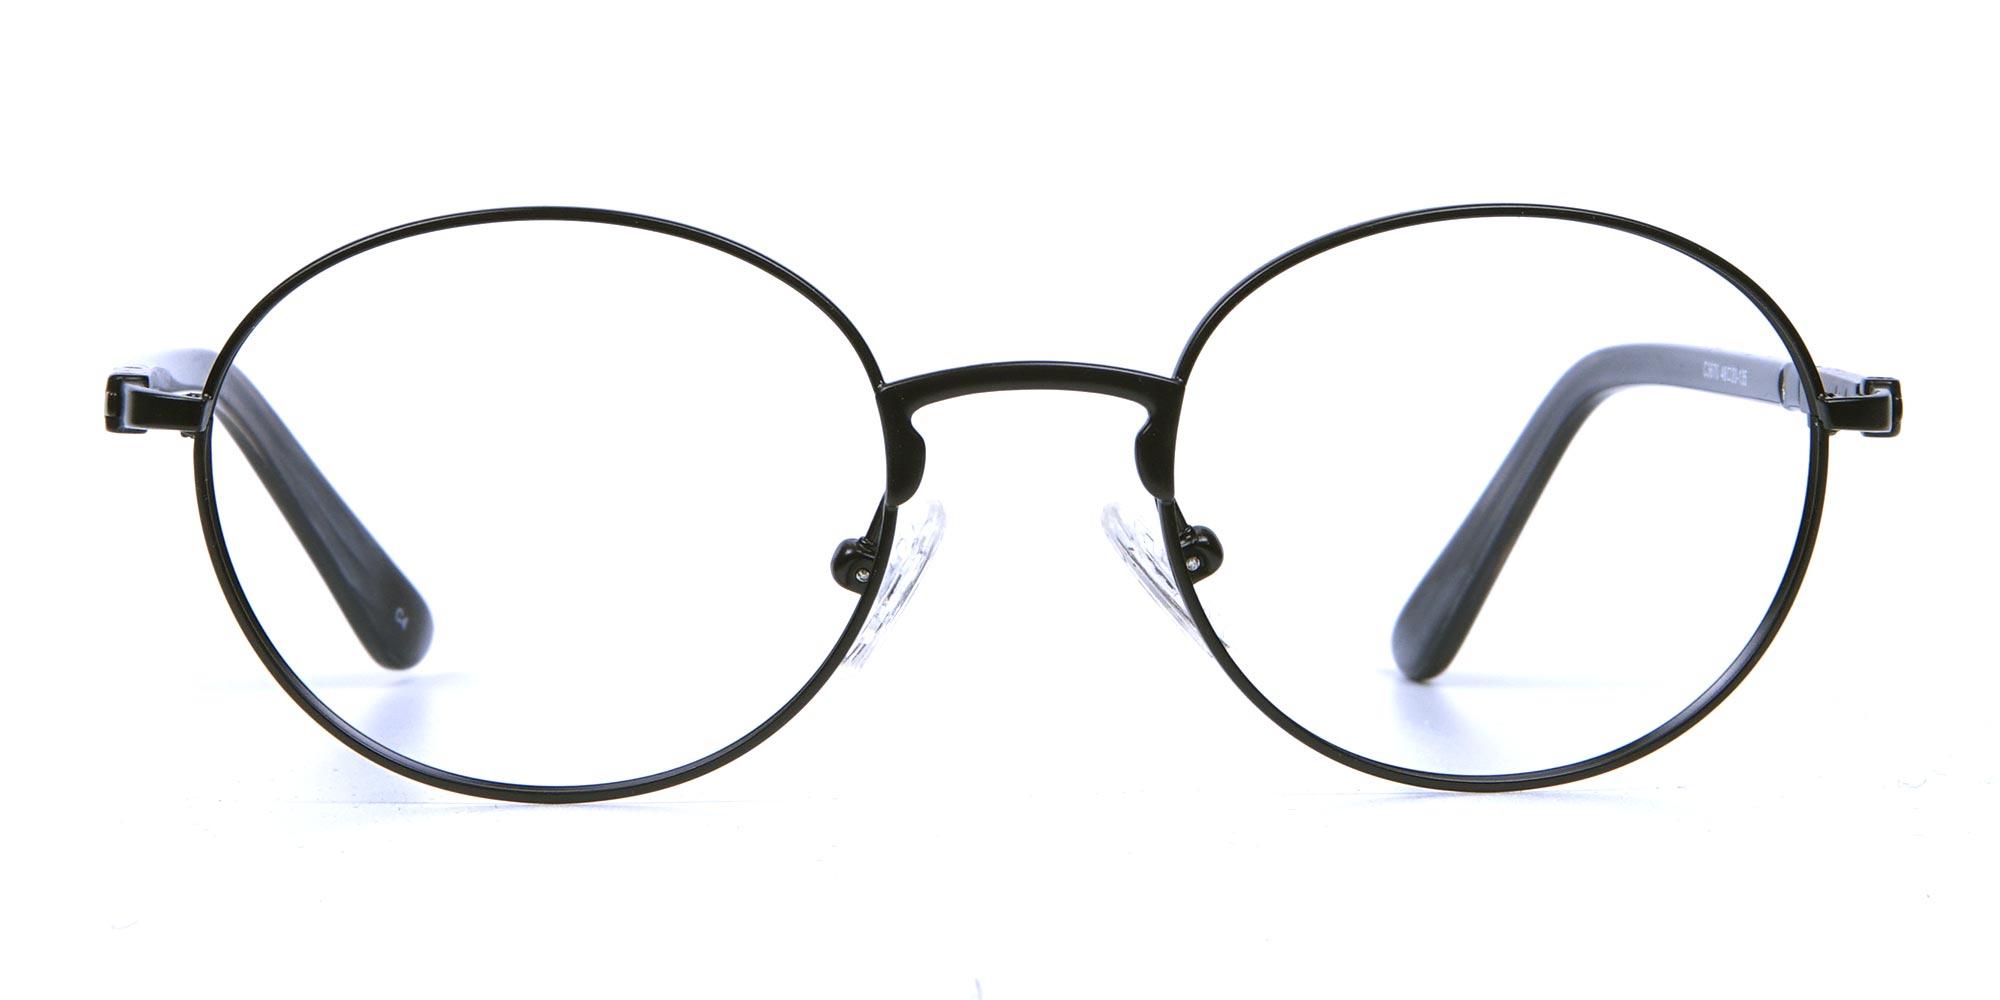 Reawakended Classics Mens Eyewear Trends 2019